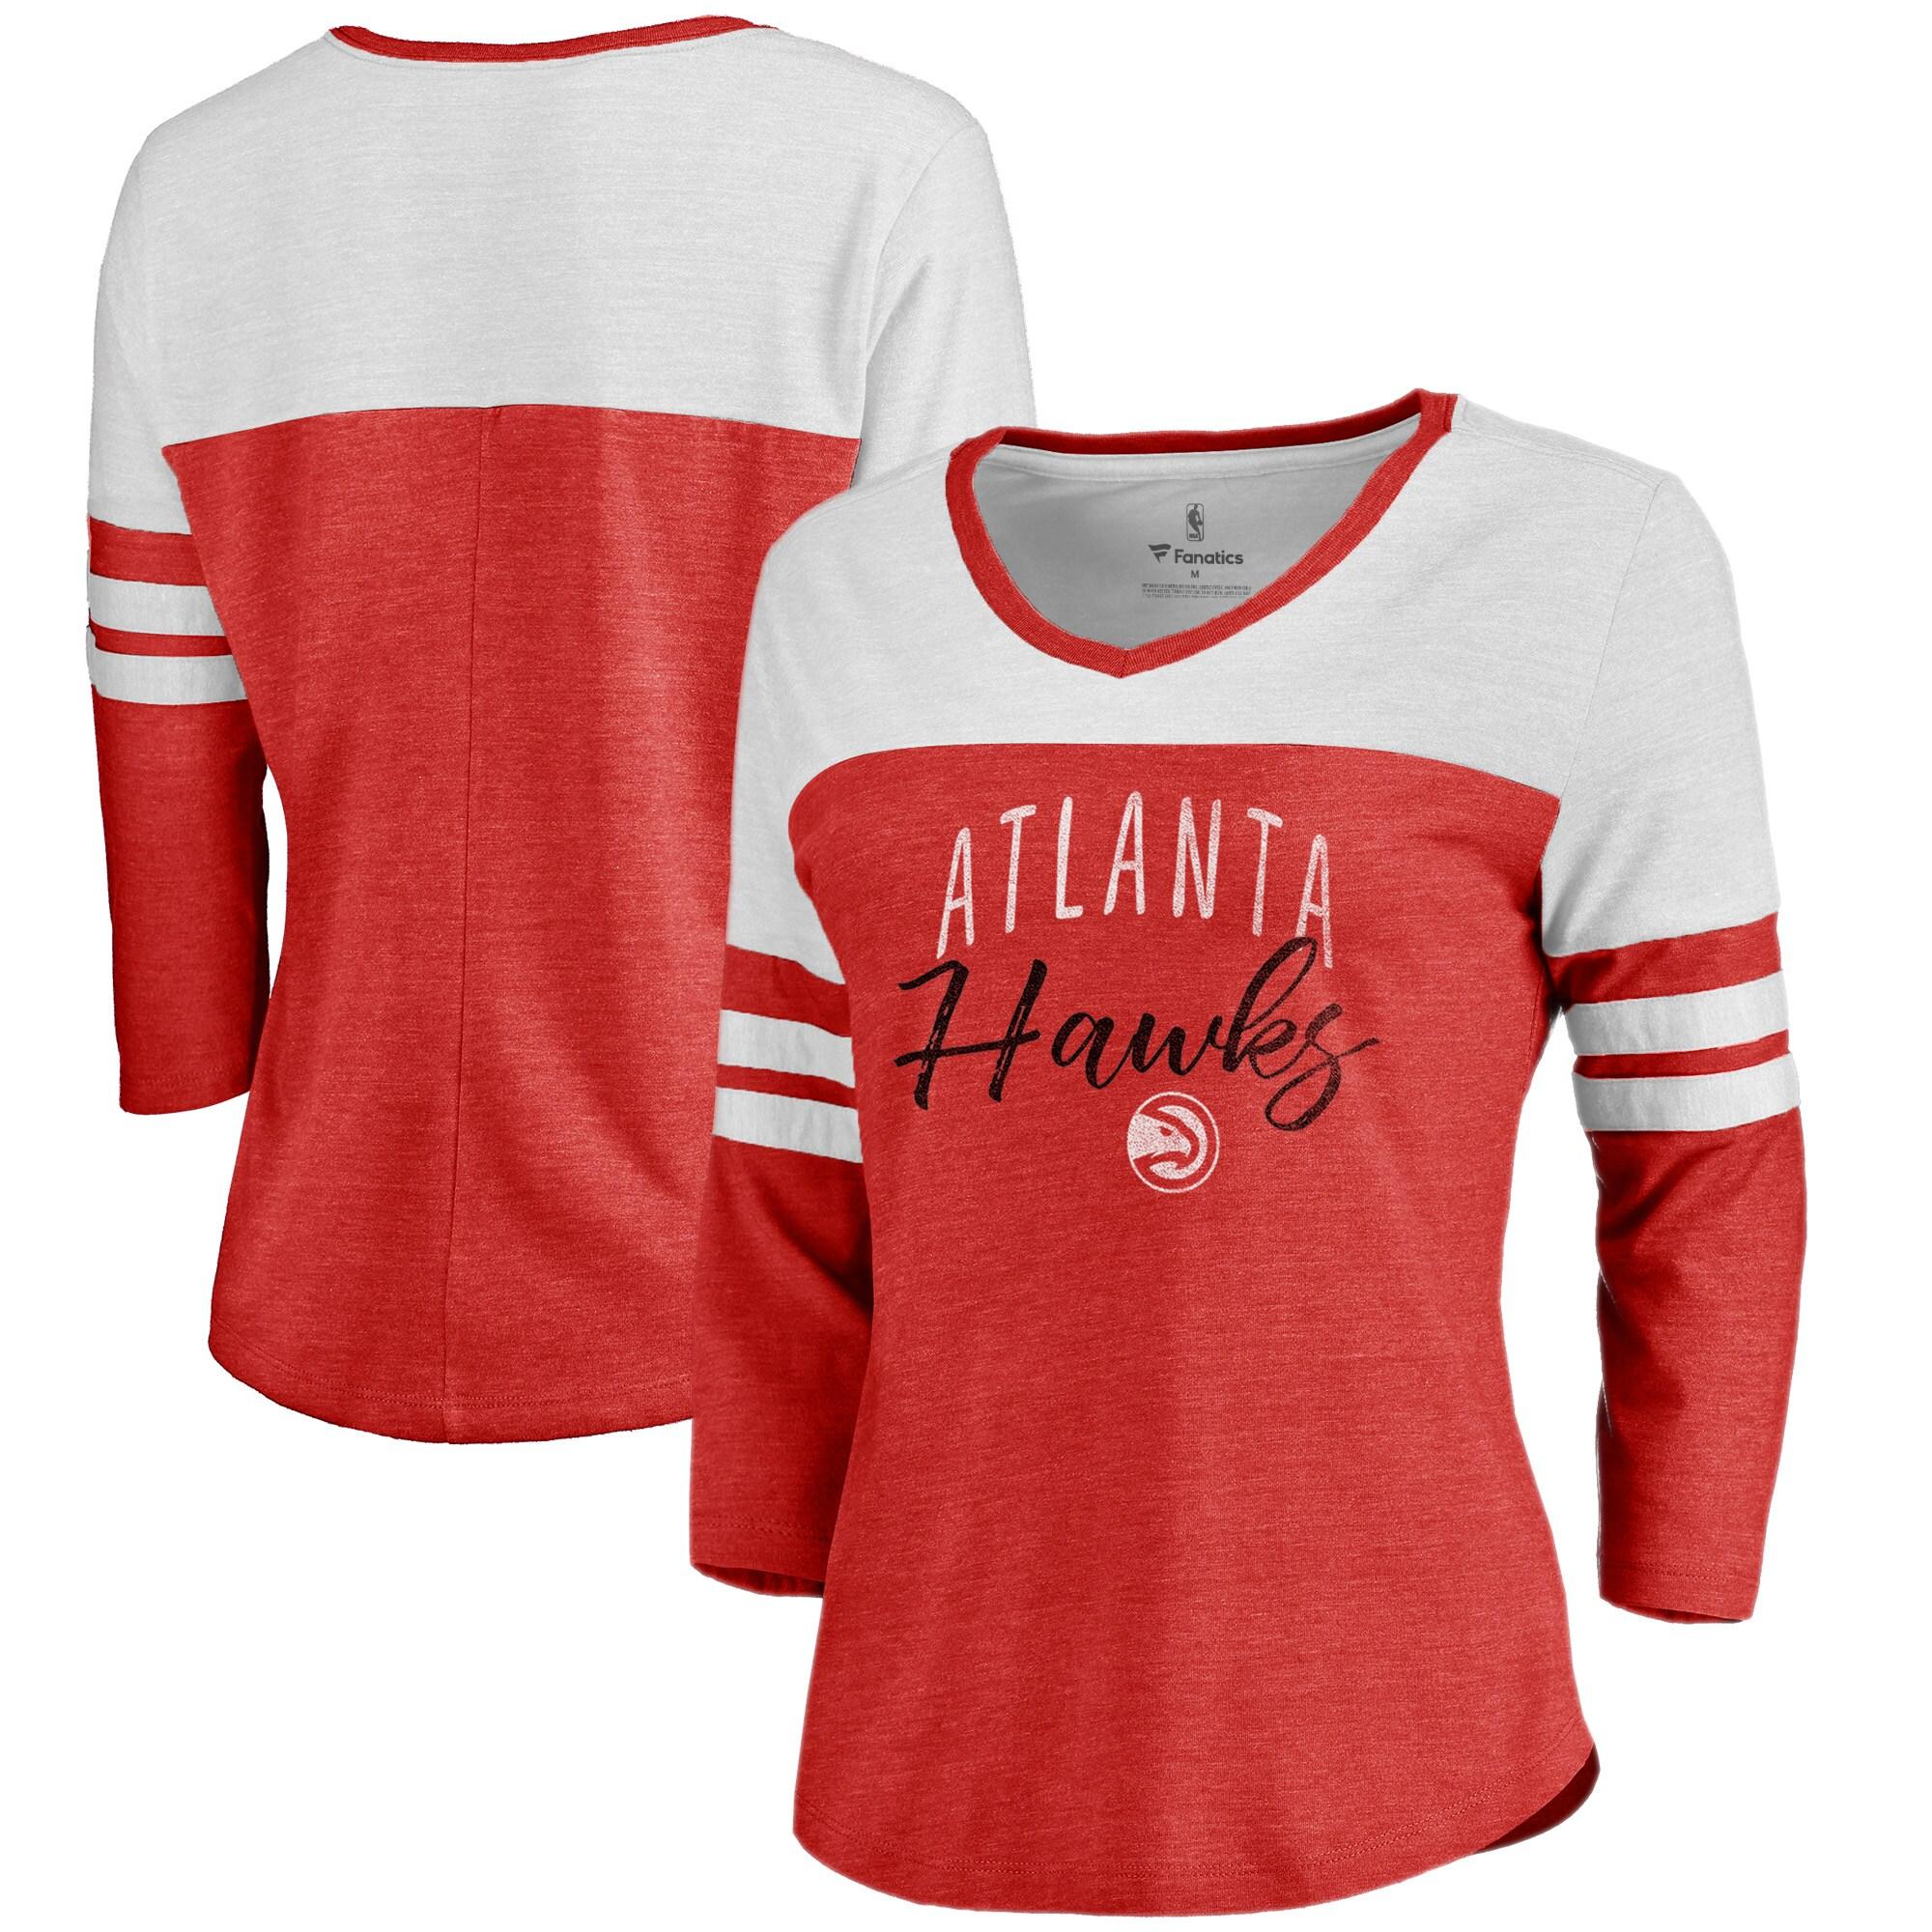 Atlanta Hawks Fanatics Branded Women's Graceful 3/4-Sleeve Raglan T-Shirt - Heathered Red